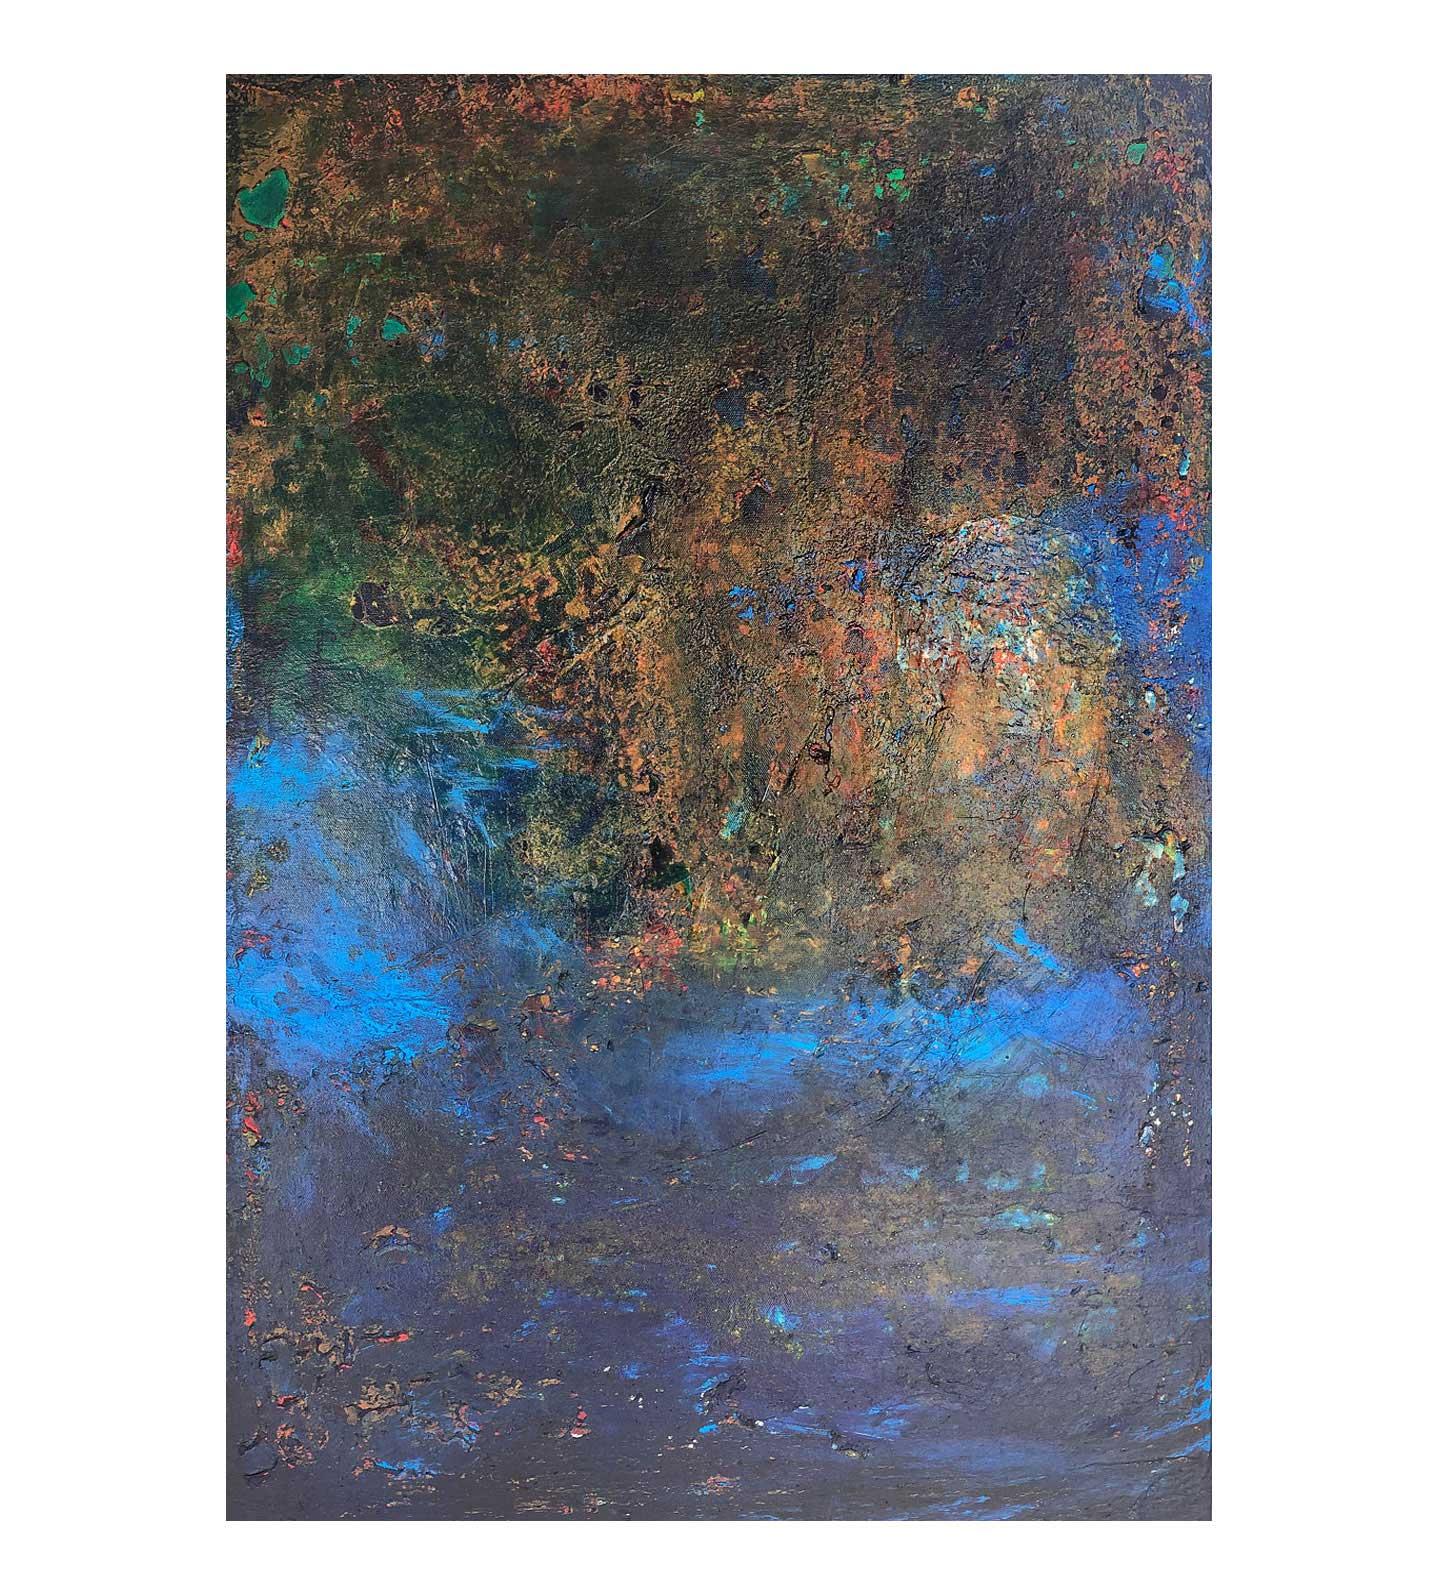 """Terra,"" painting by Tamara Anna Pawlak"